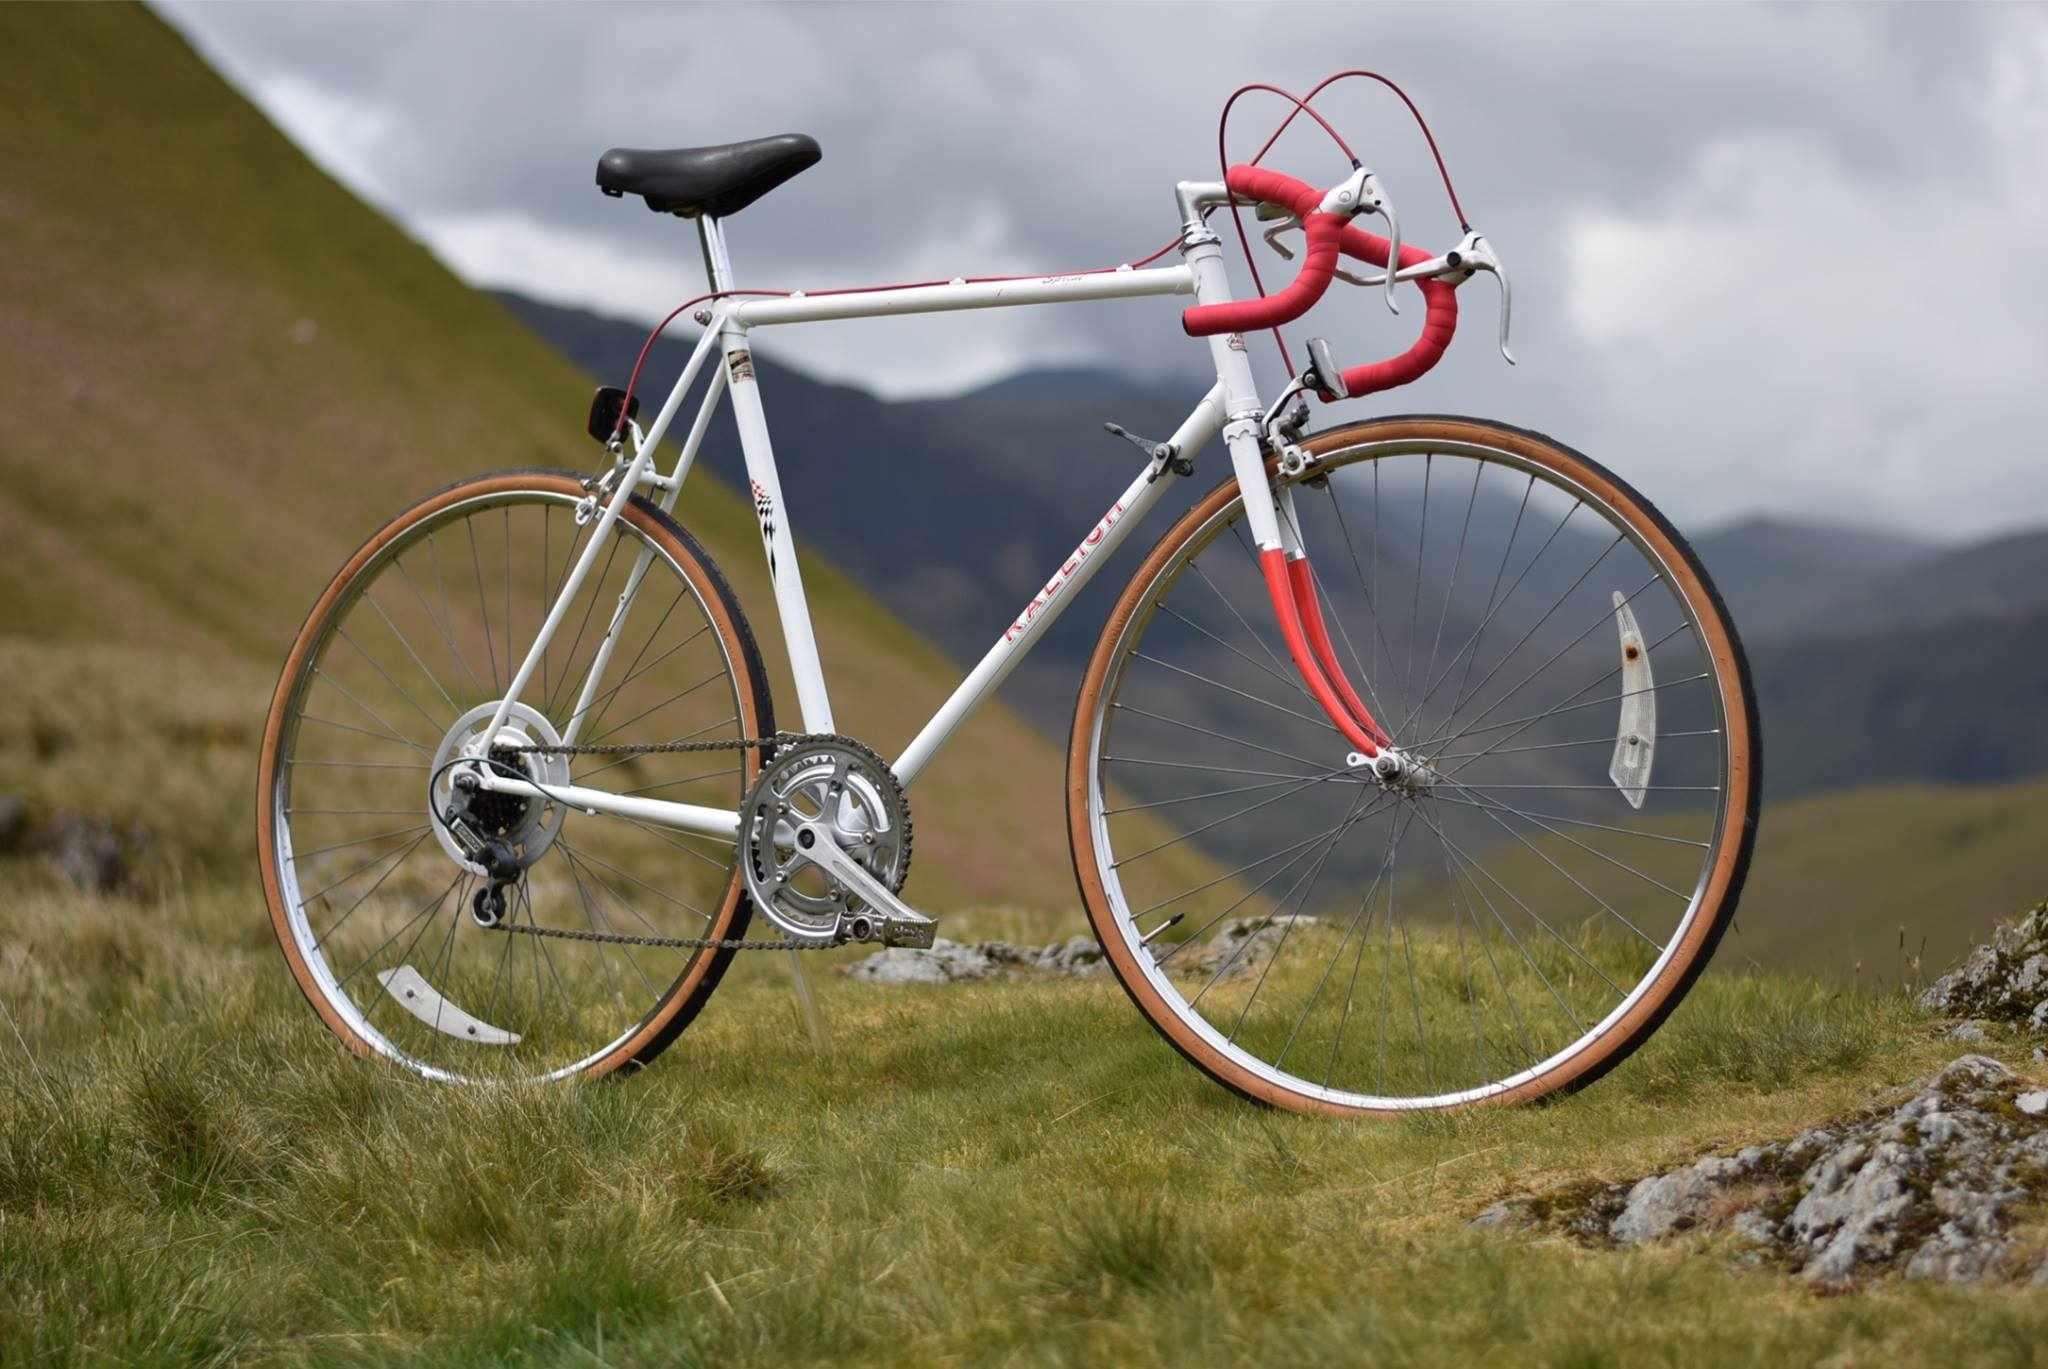 Cycling Plus editor Rob's 1983 Raleigh Sprint road bike